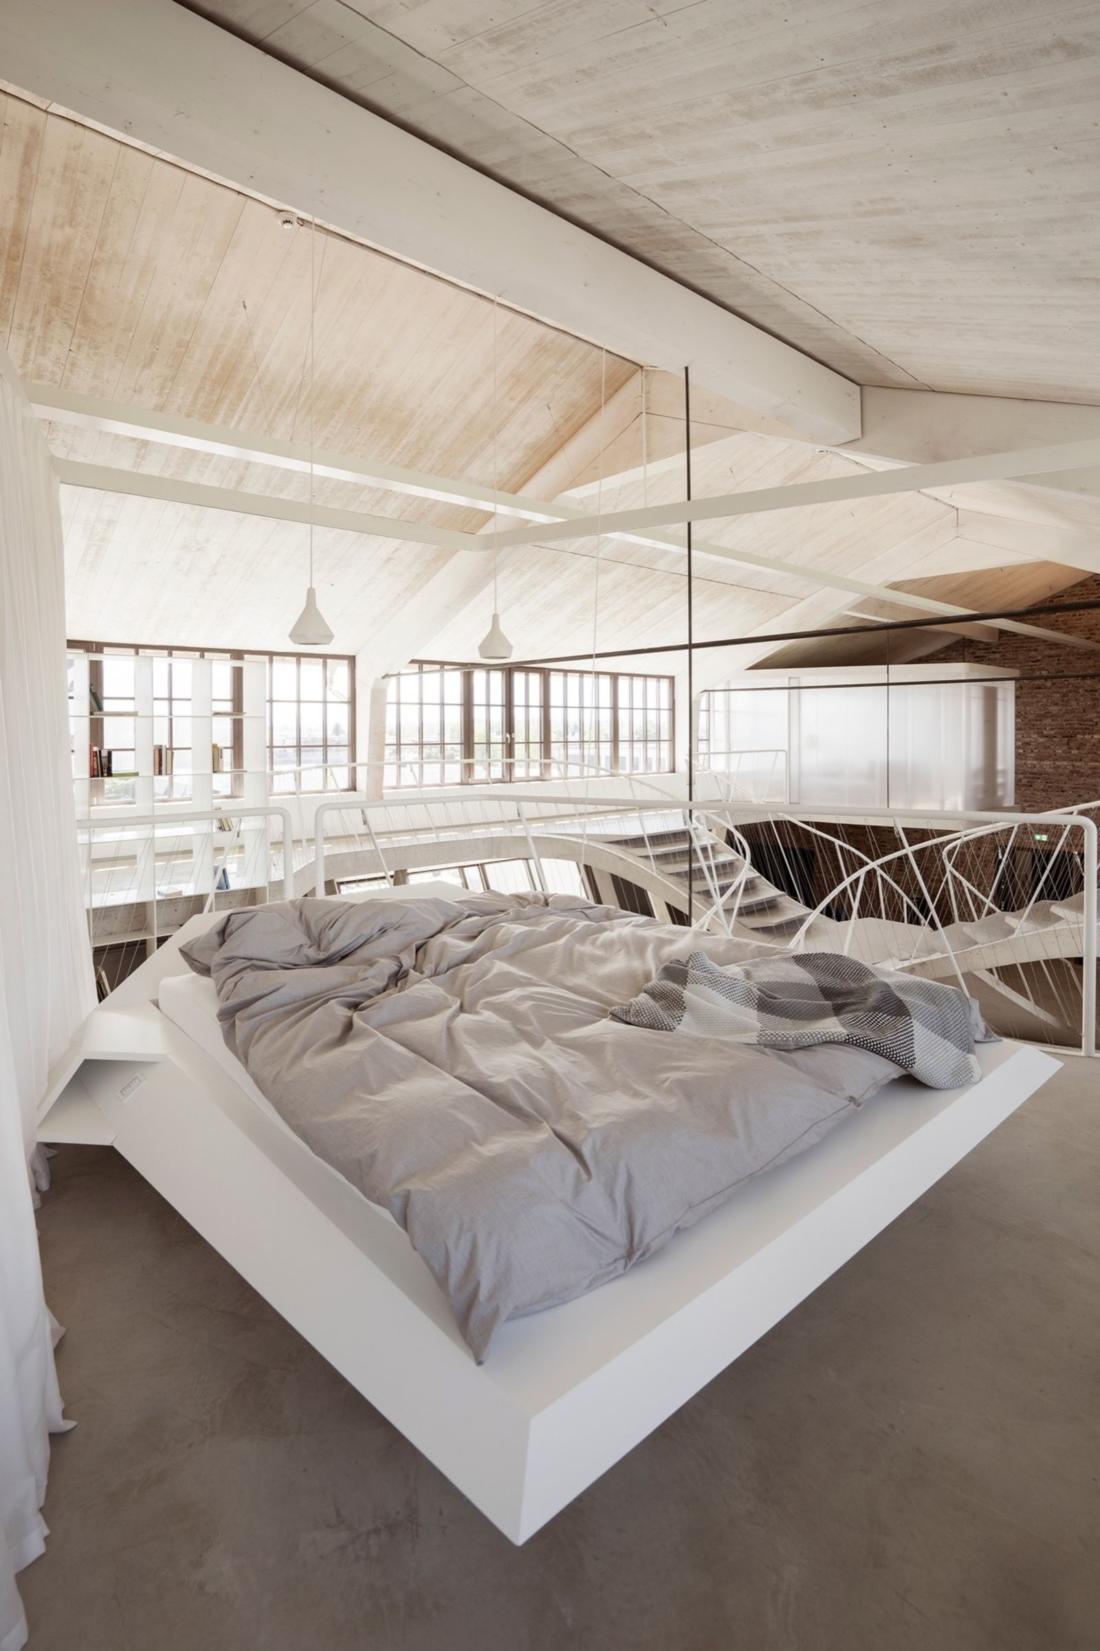 Проект Panzerhalle от студии Smartvoll Architekten ZT KG 7